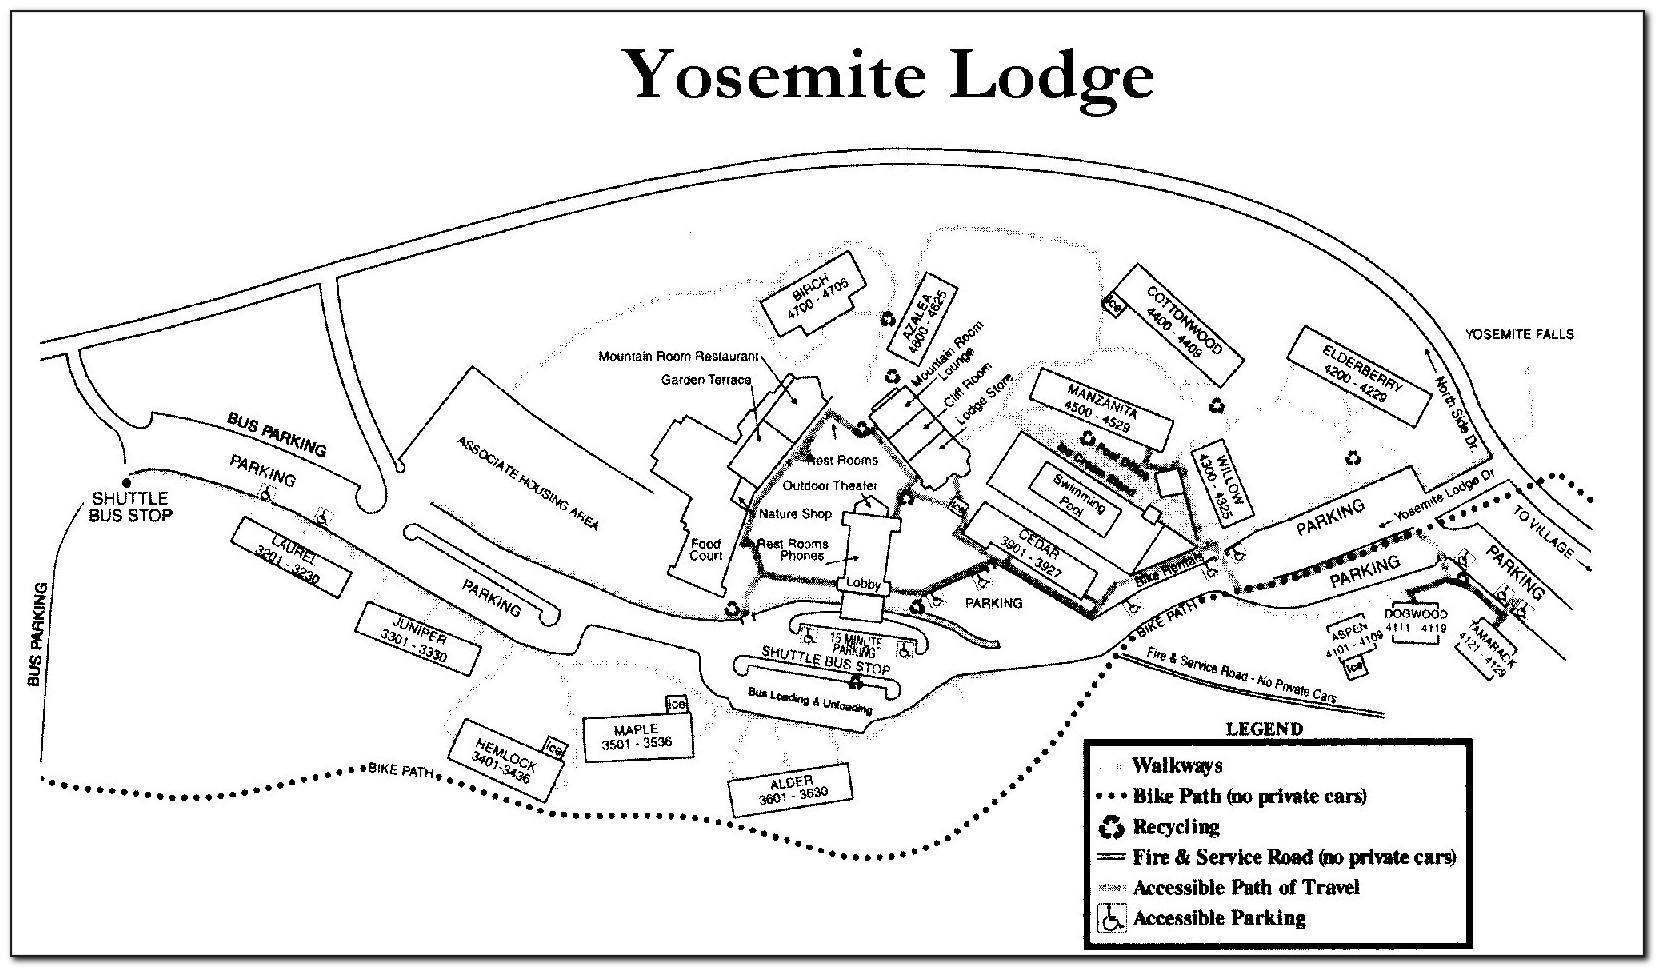 Yosemite Hotel Map